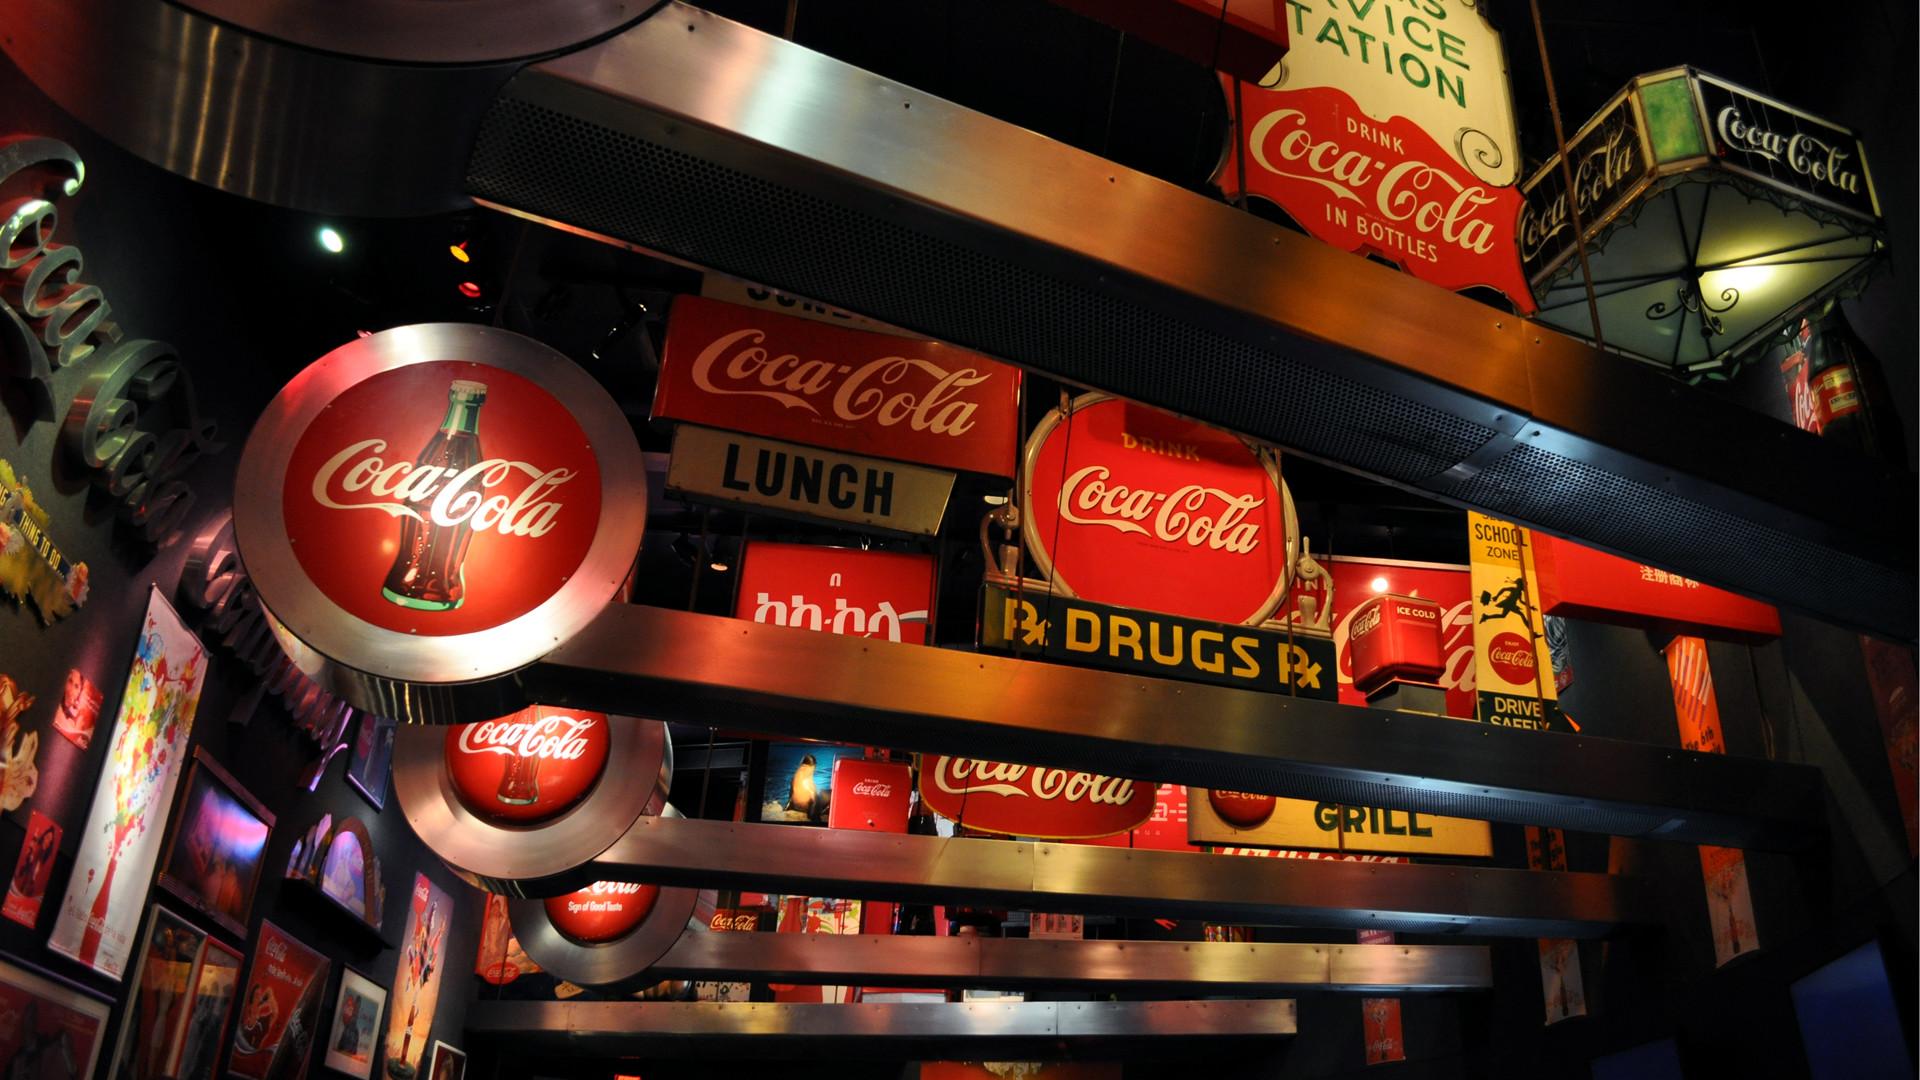 2048x2048 Image For Vintage Coca Cola Wallpaper Iphone